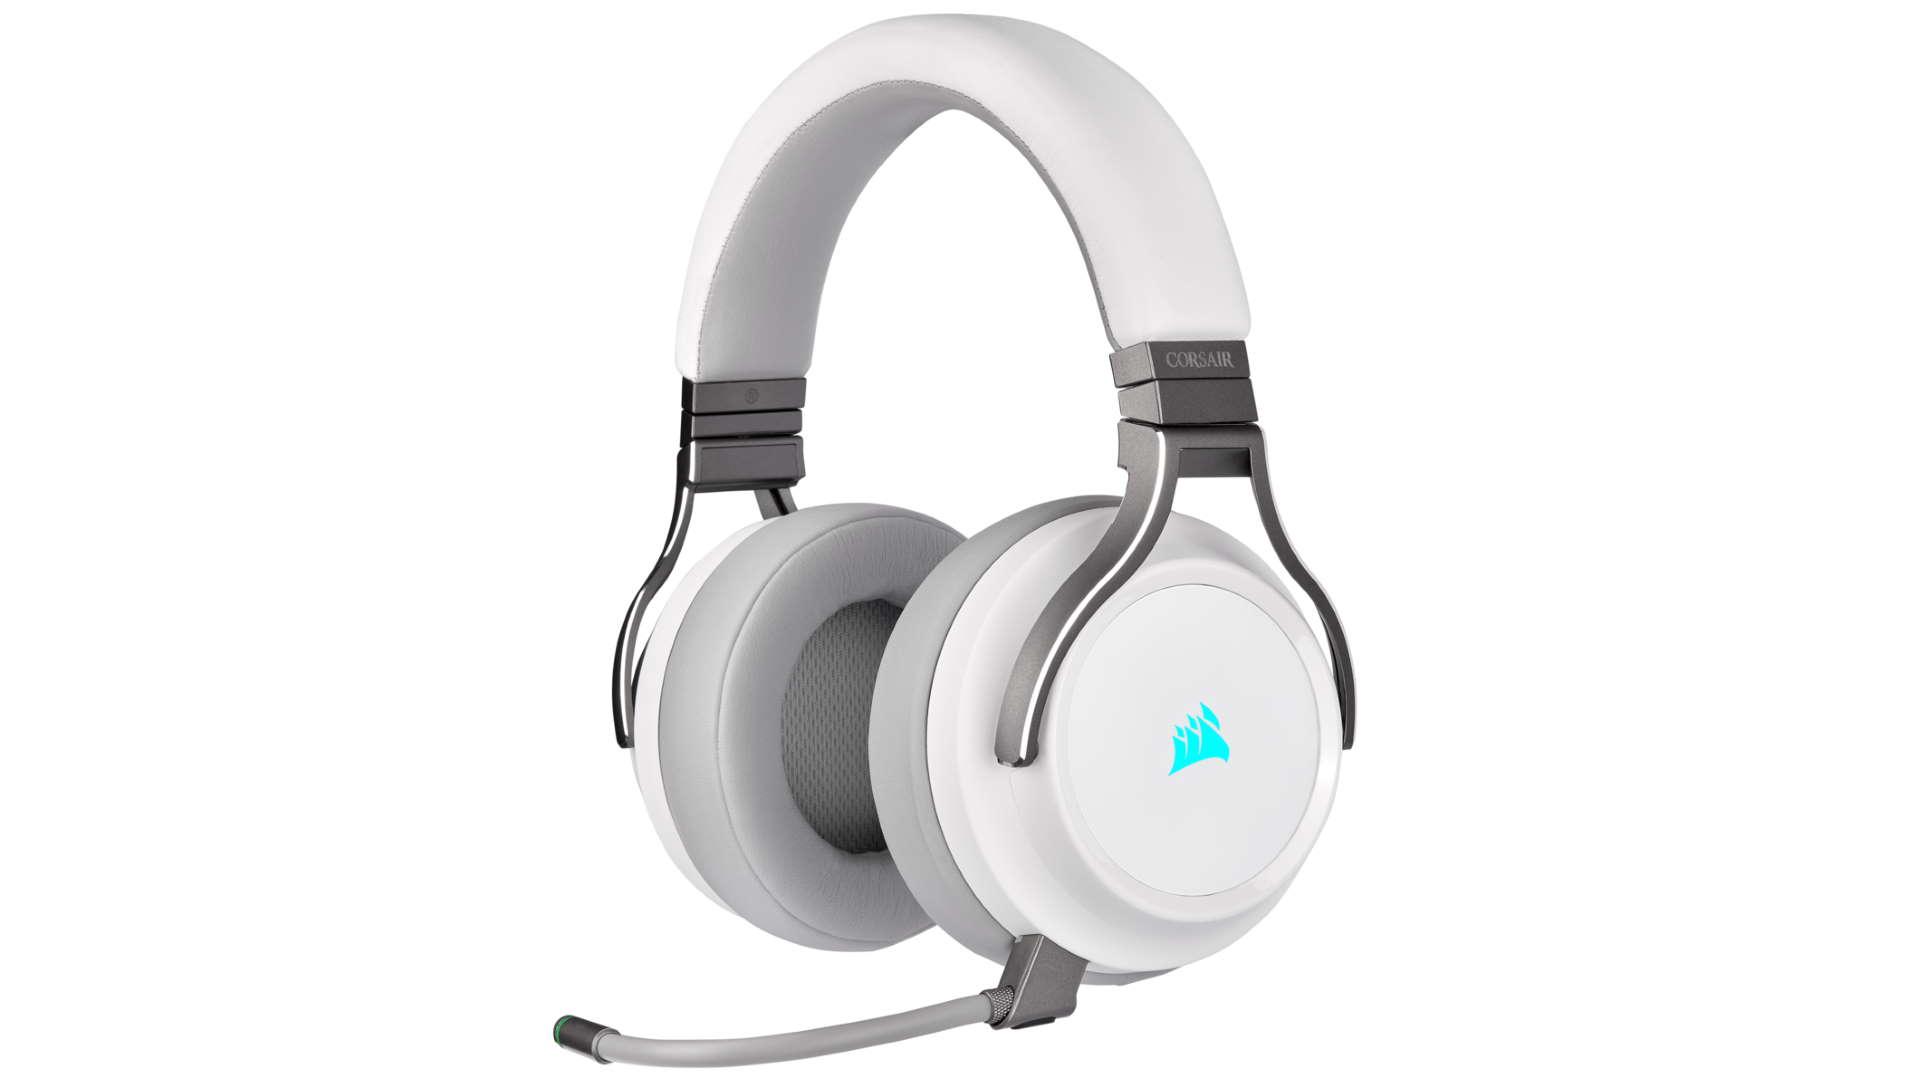 Corsair Virtuoso Rgb Wireless Gaming Headset Review Stunning Build Quality Sound Pcgamesn